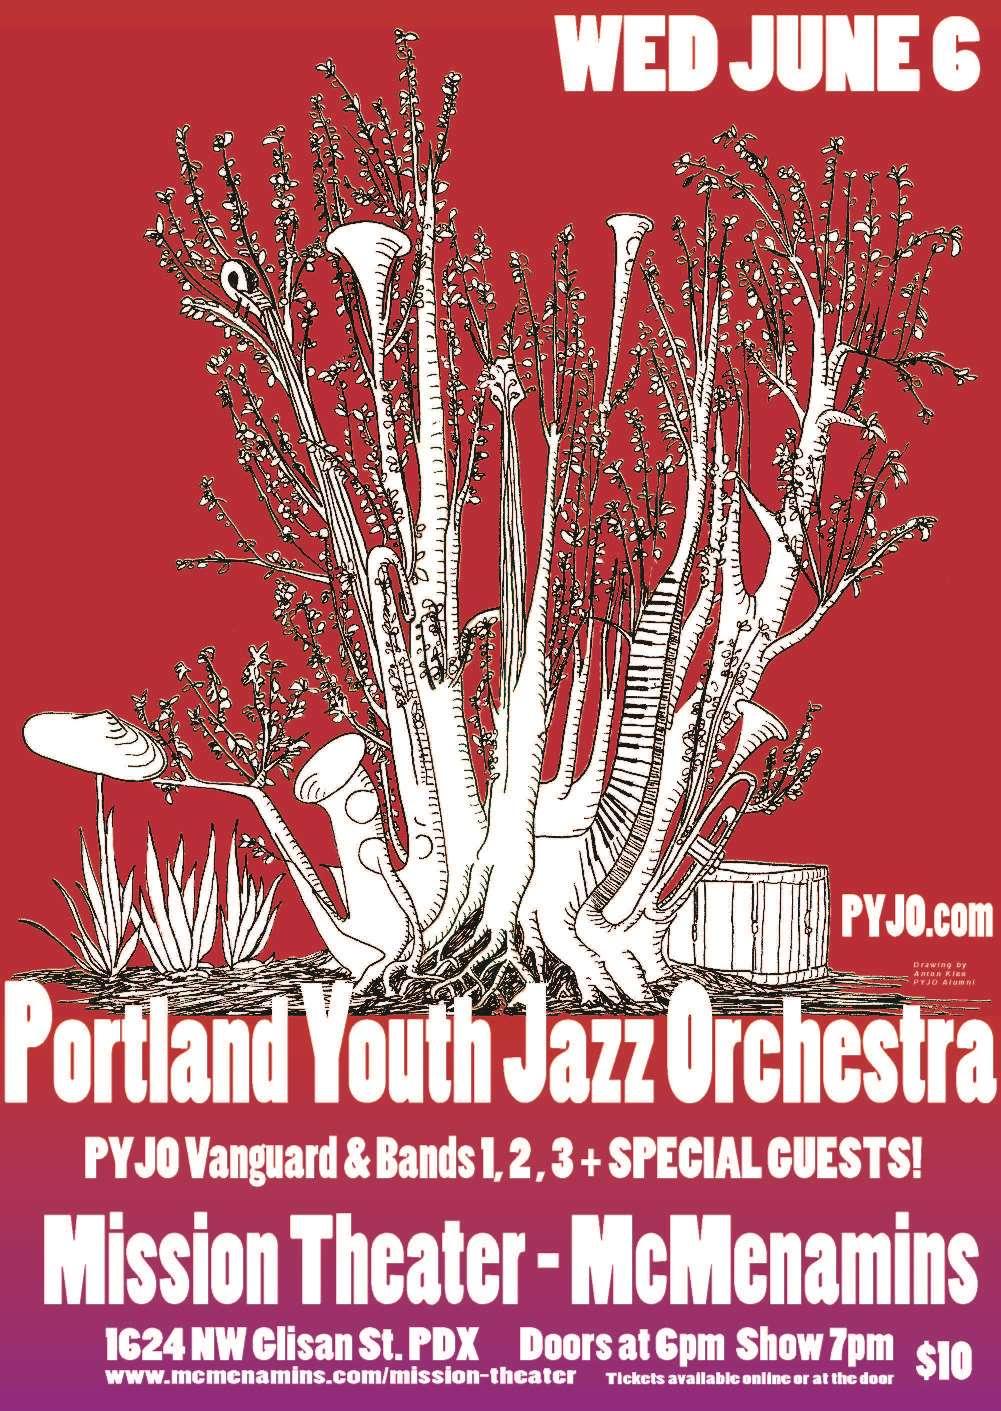 PYJO Vanguard & Bands 1, 2, & 3